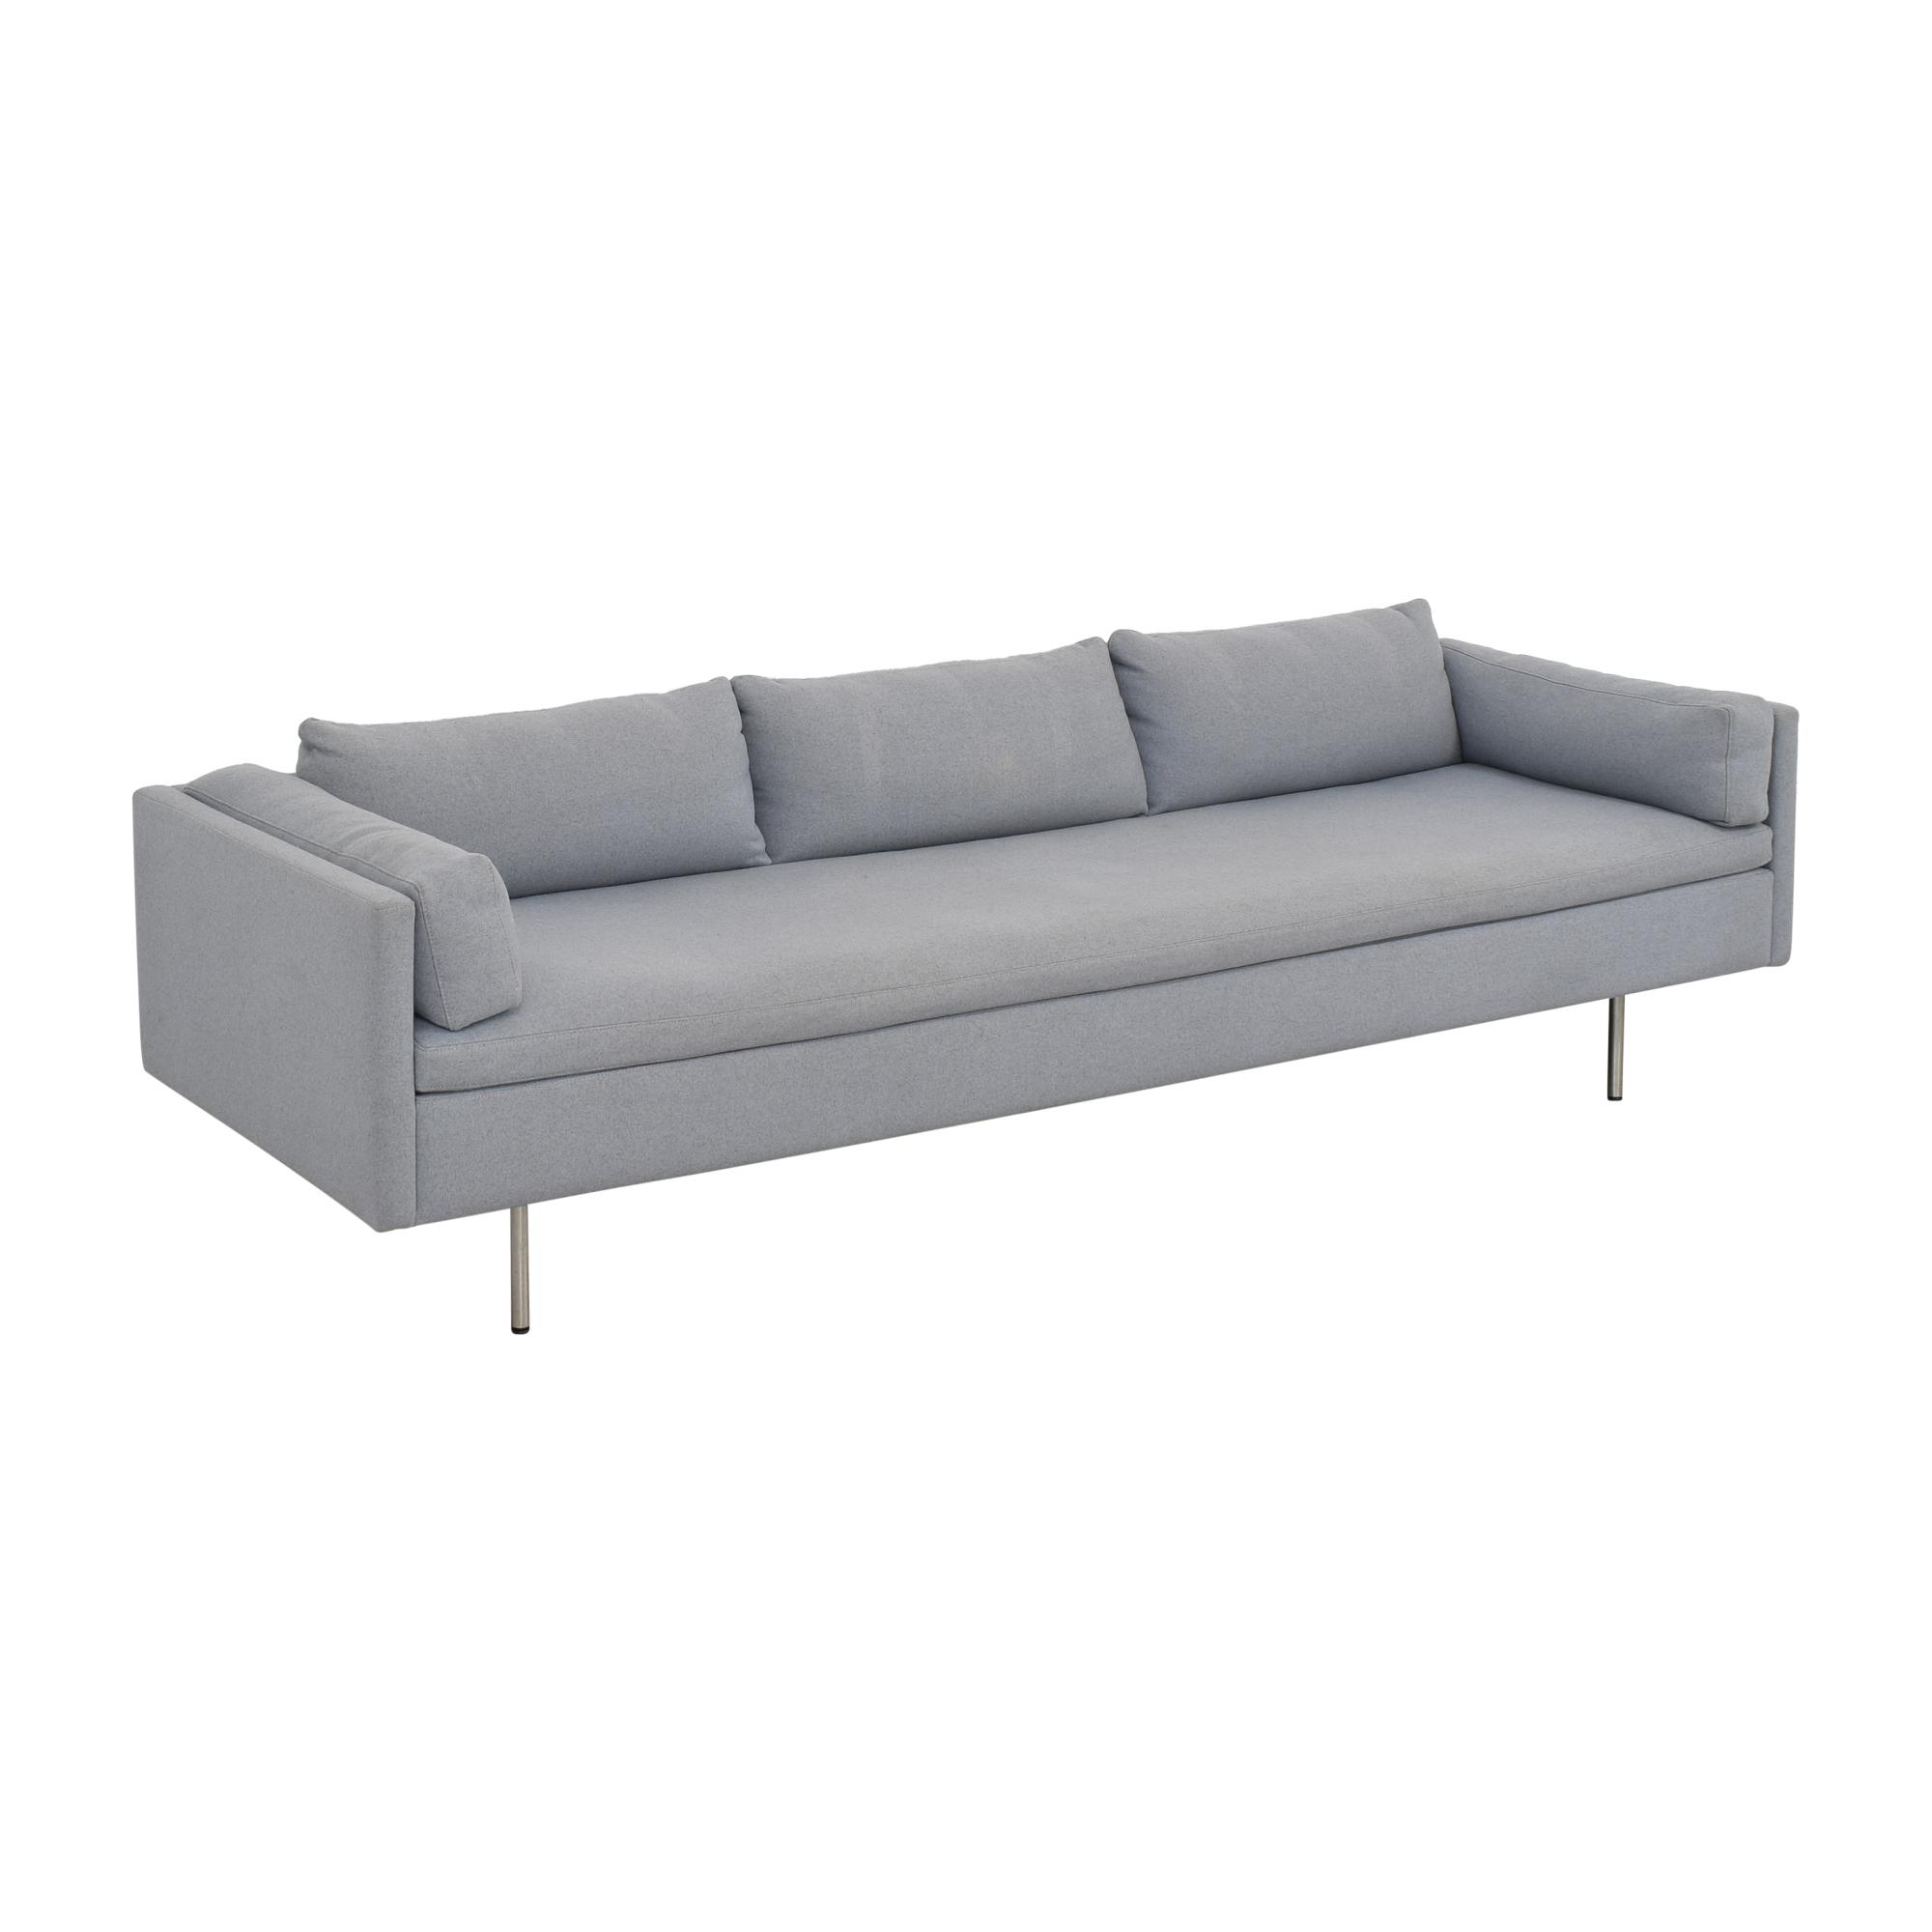 Herman Miller Herman Miller Bolster Sofa used